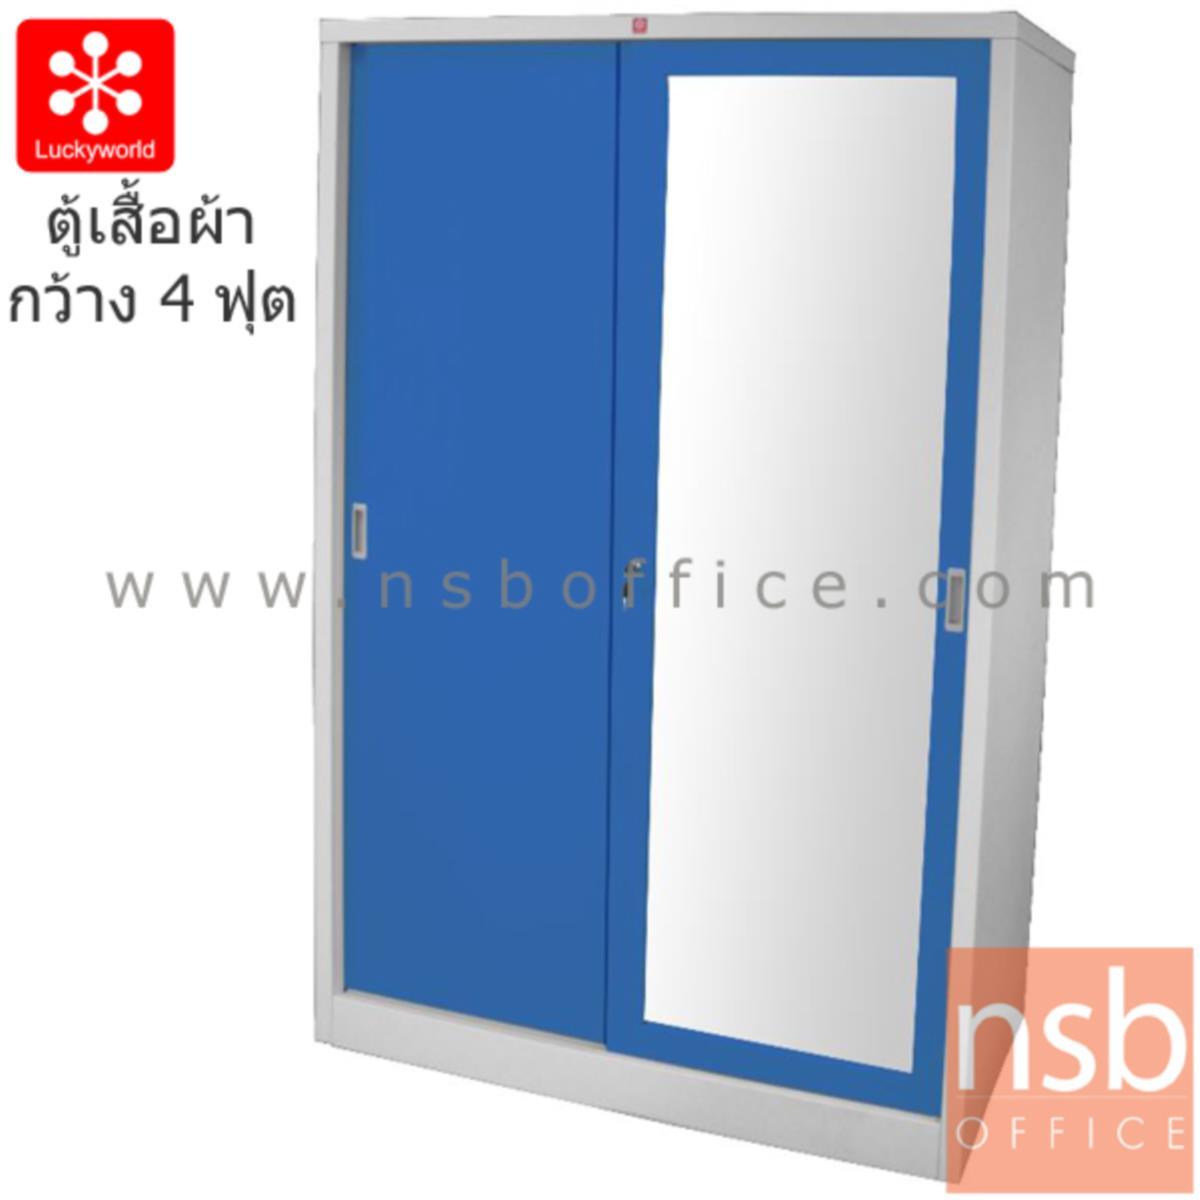 E31A060:ตู้เสื้อผ้า 1 บานเลื่อนทึบ 1 บานเลื่อนกระจกเงา รุ่น KSV-126 118W cm สีสัน